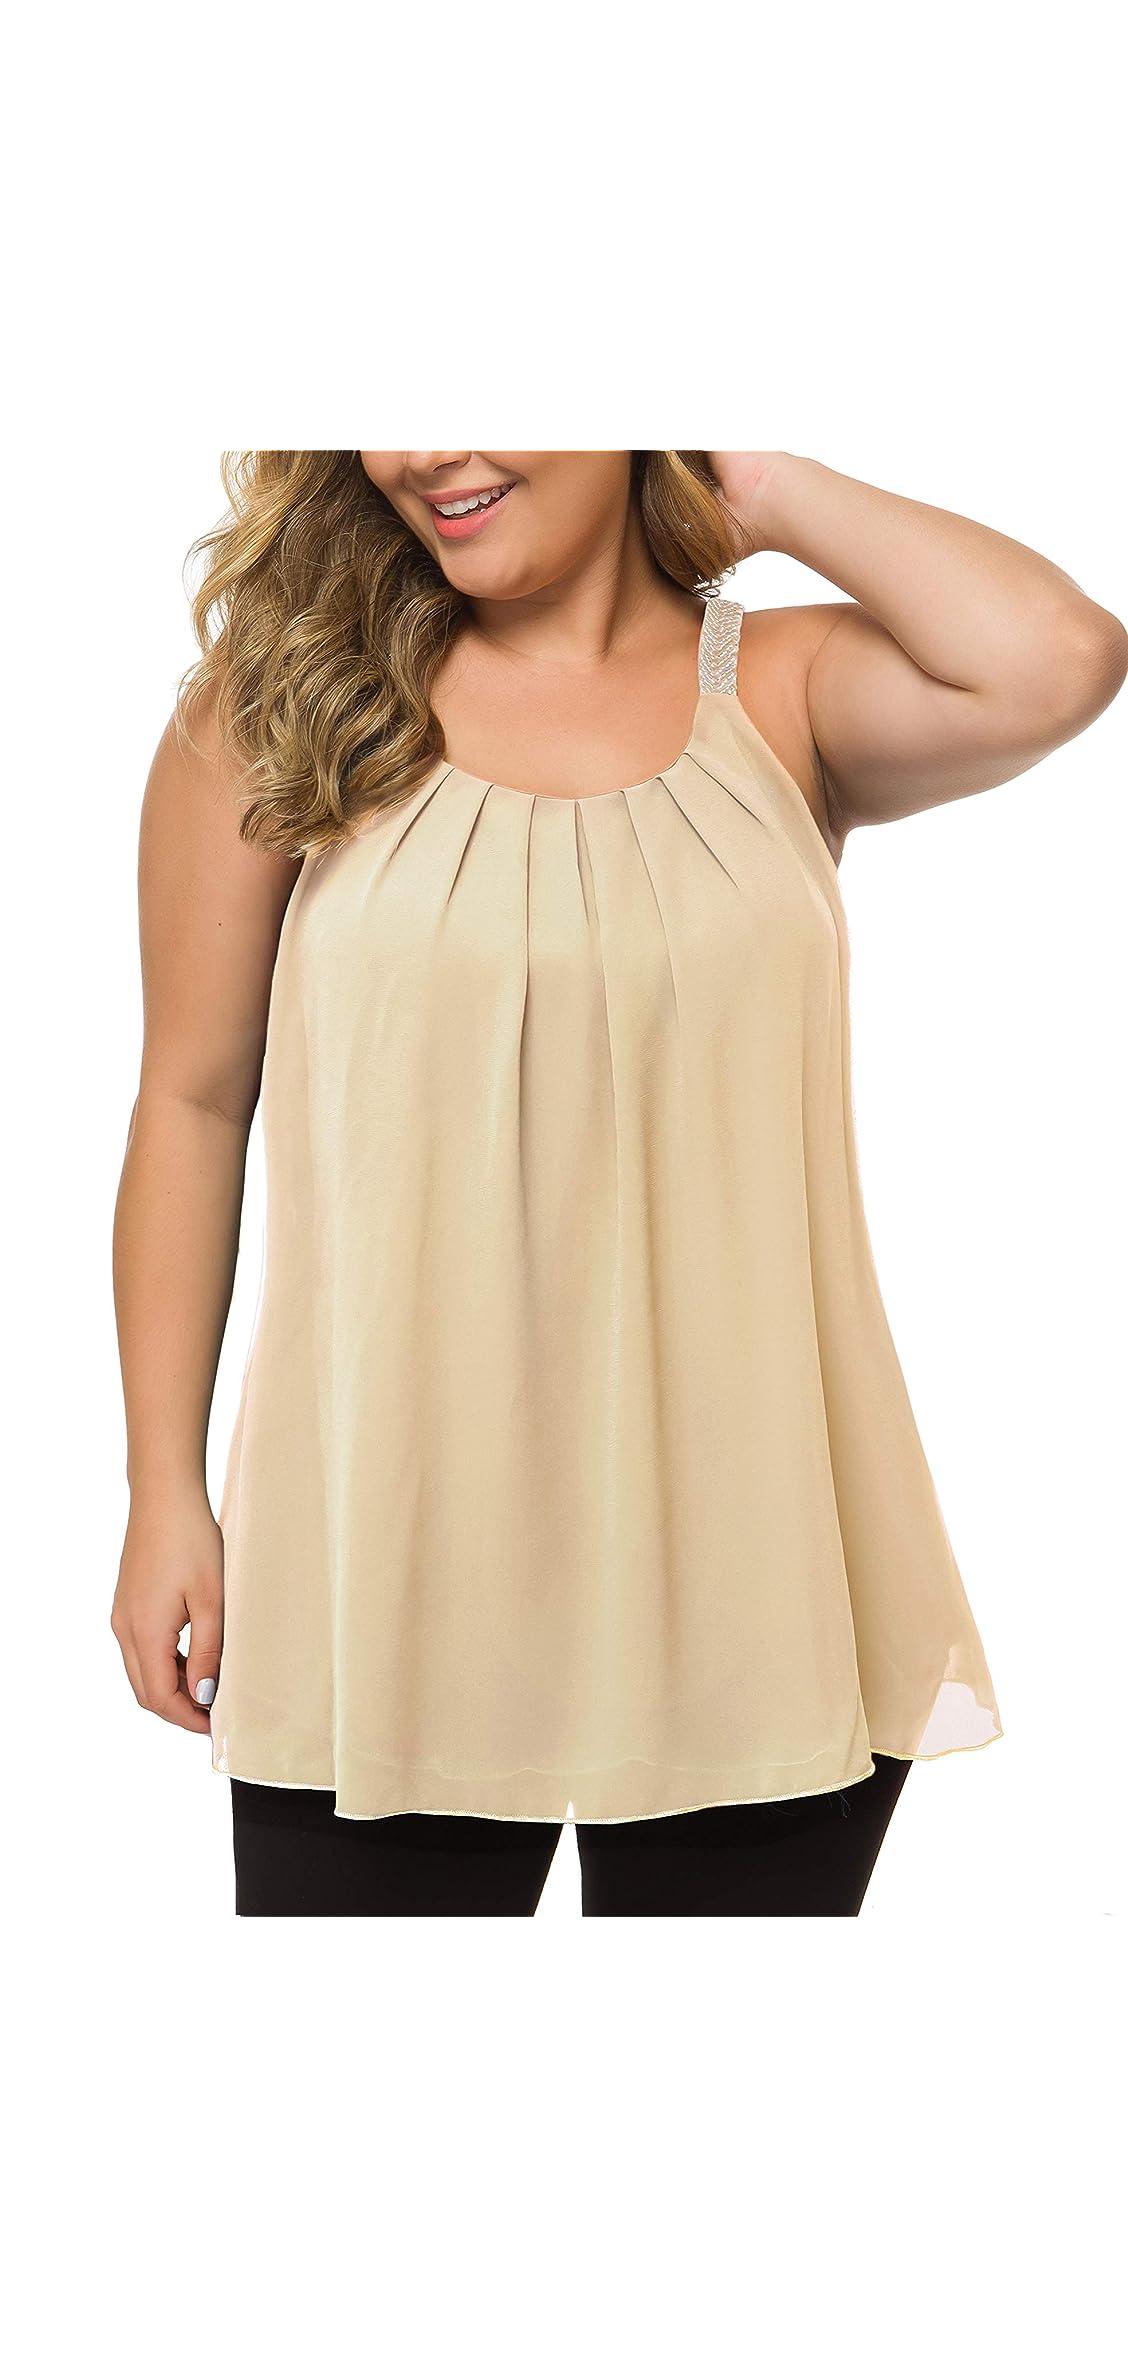 Women's Plus Size Cami Casual Pleated Chiffon Tank Top